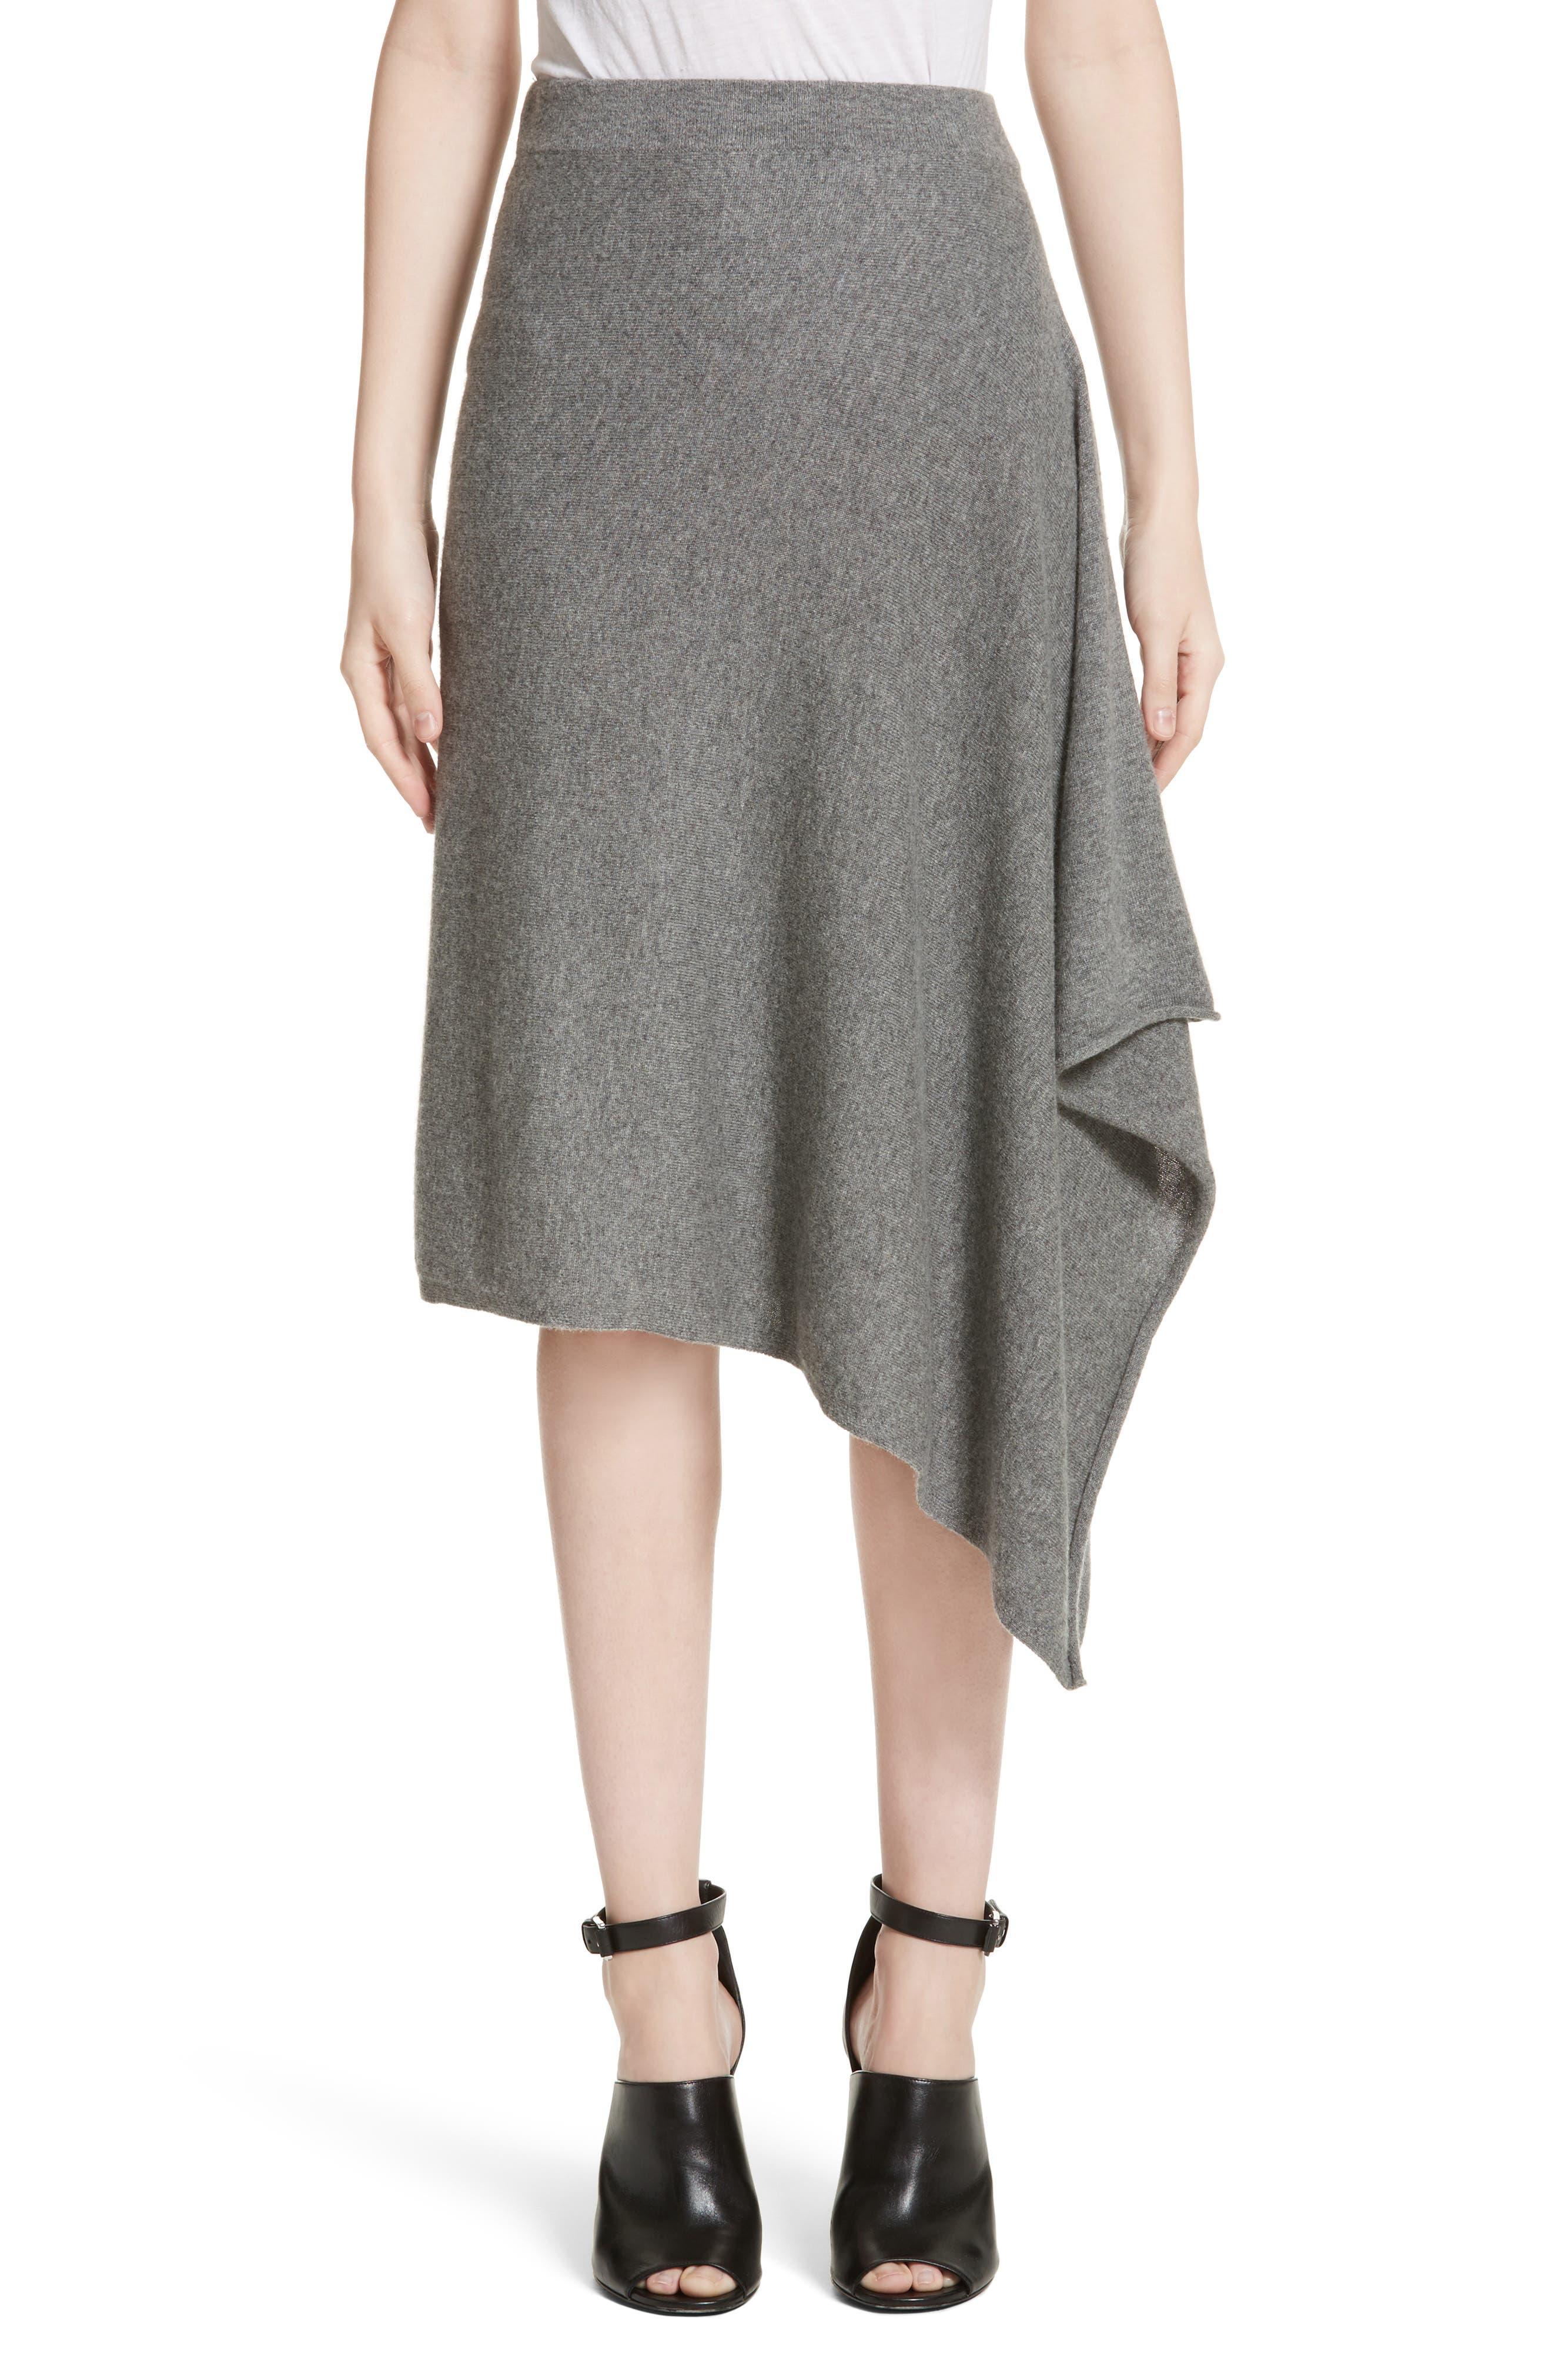 Michael Kors Cashmere Handkerchief Hem Skirt